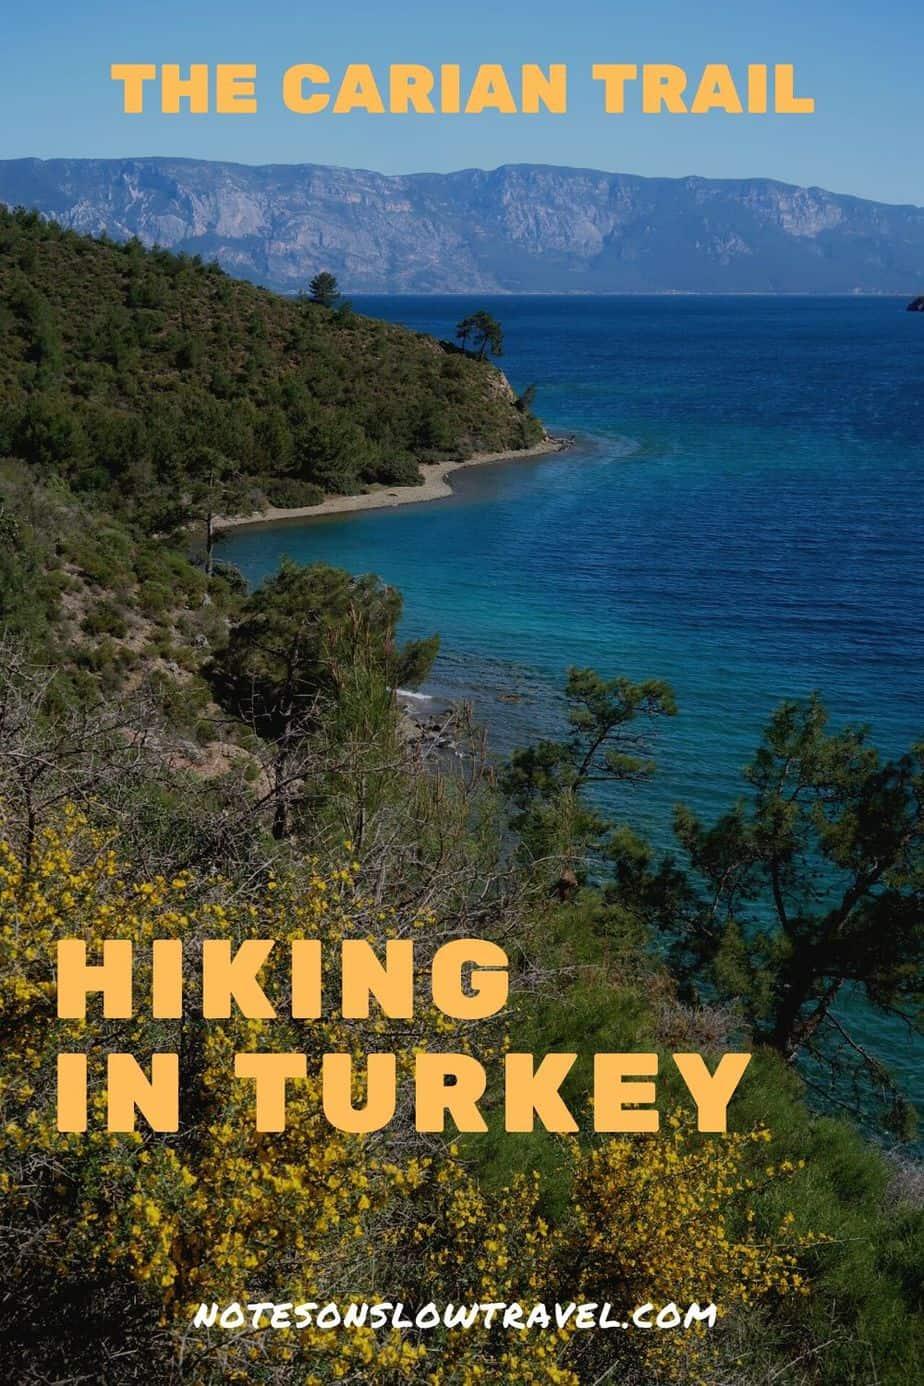 Hiking the Datça Peninsula